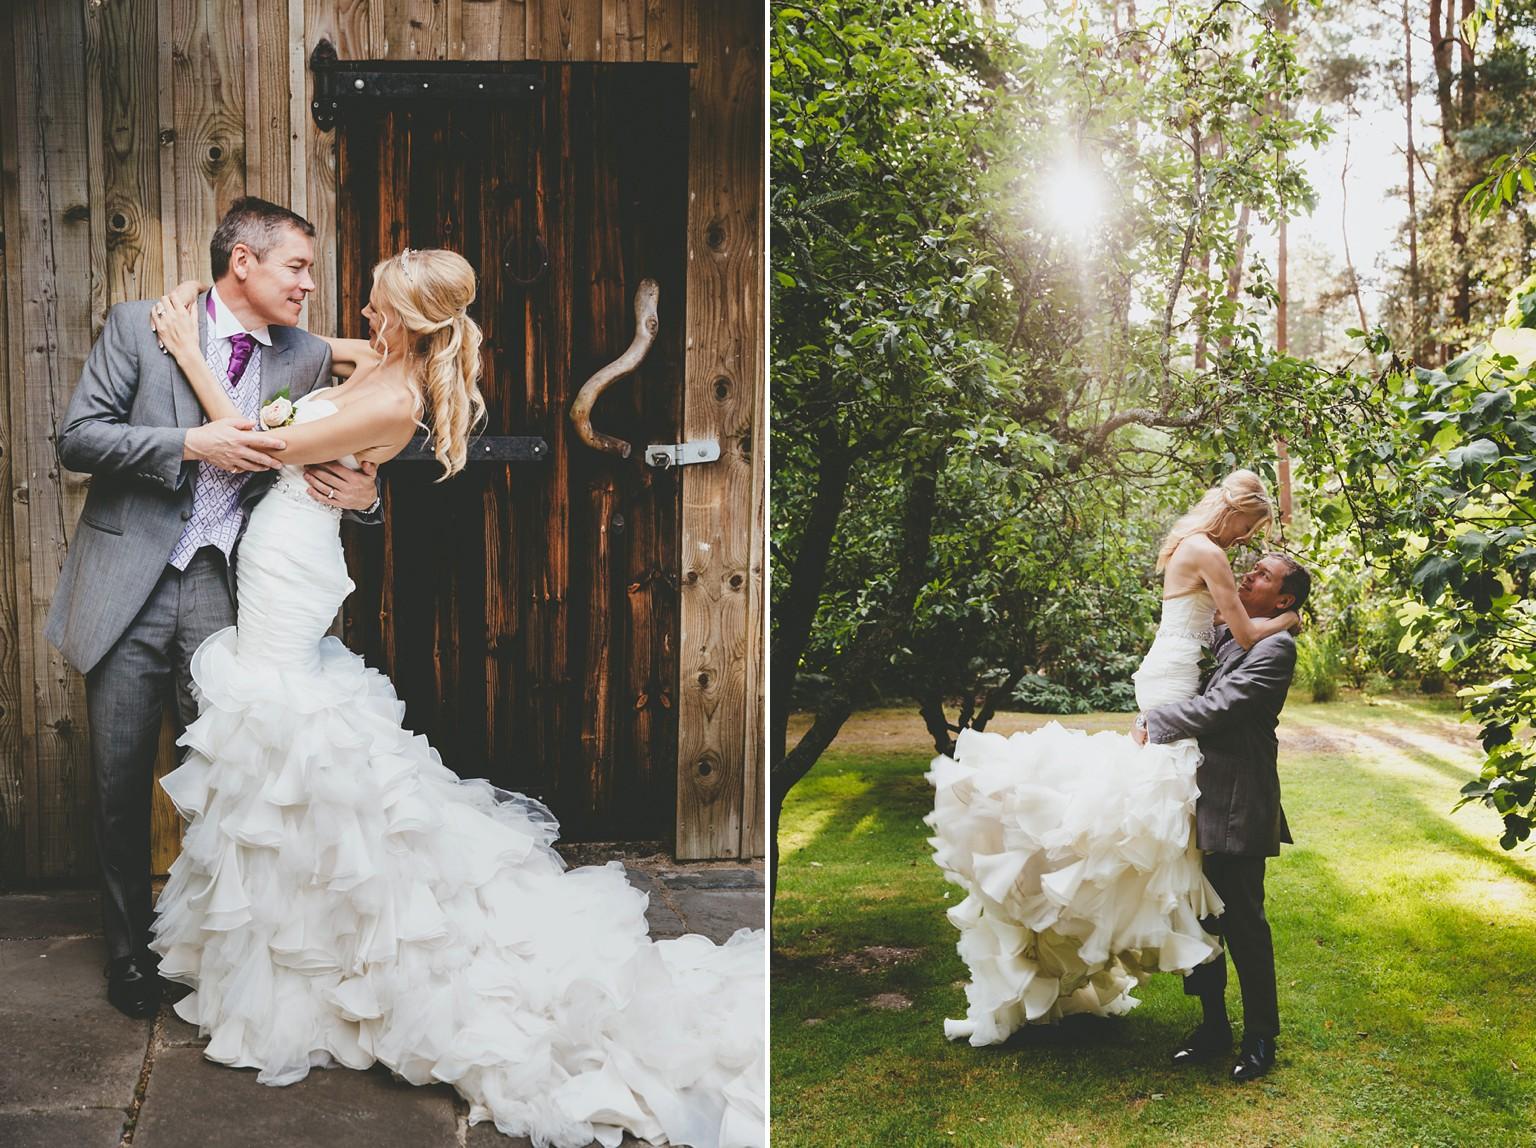 Creative-wedding-photographers-00003